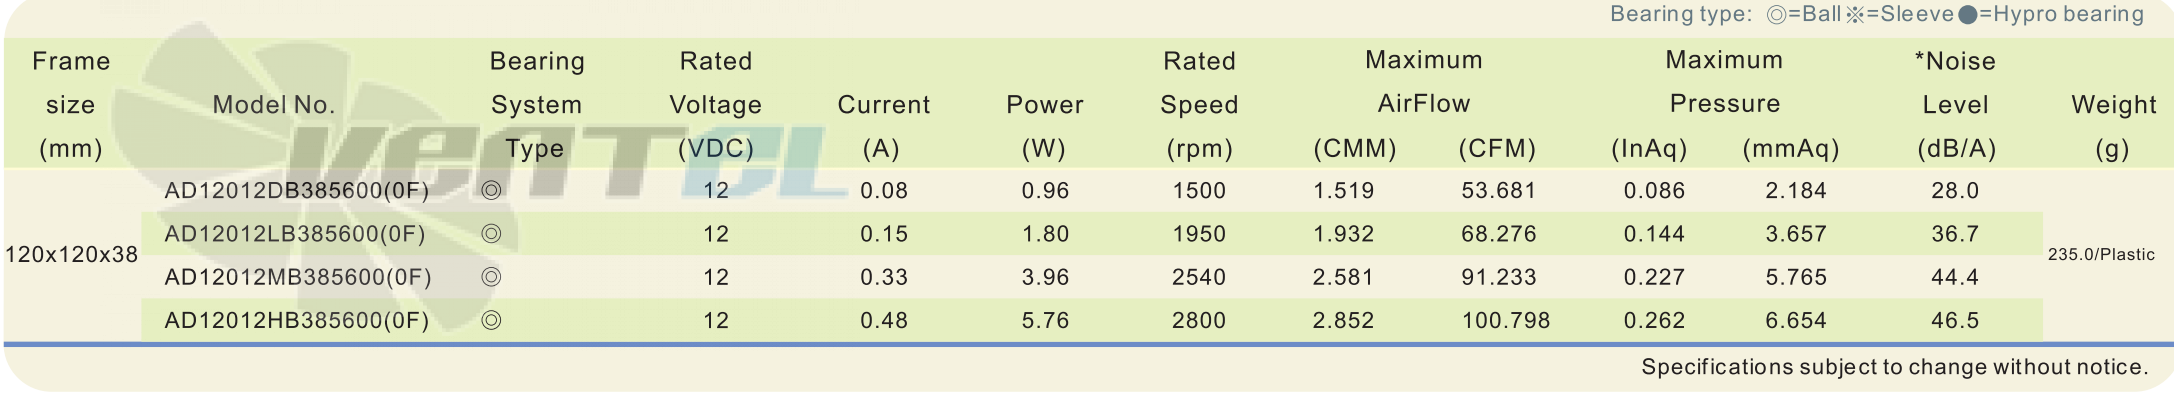 Рабочие параметры и характеристики ADDA AD12012LB385600-0F DC